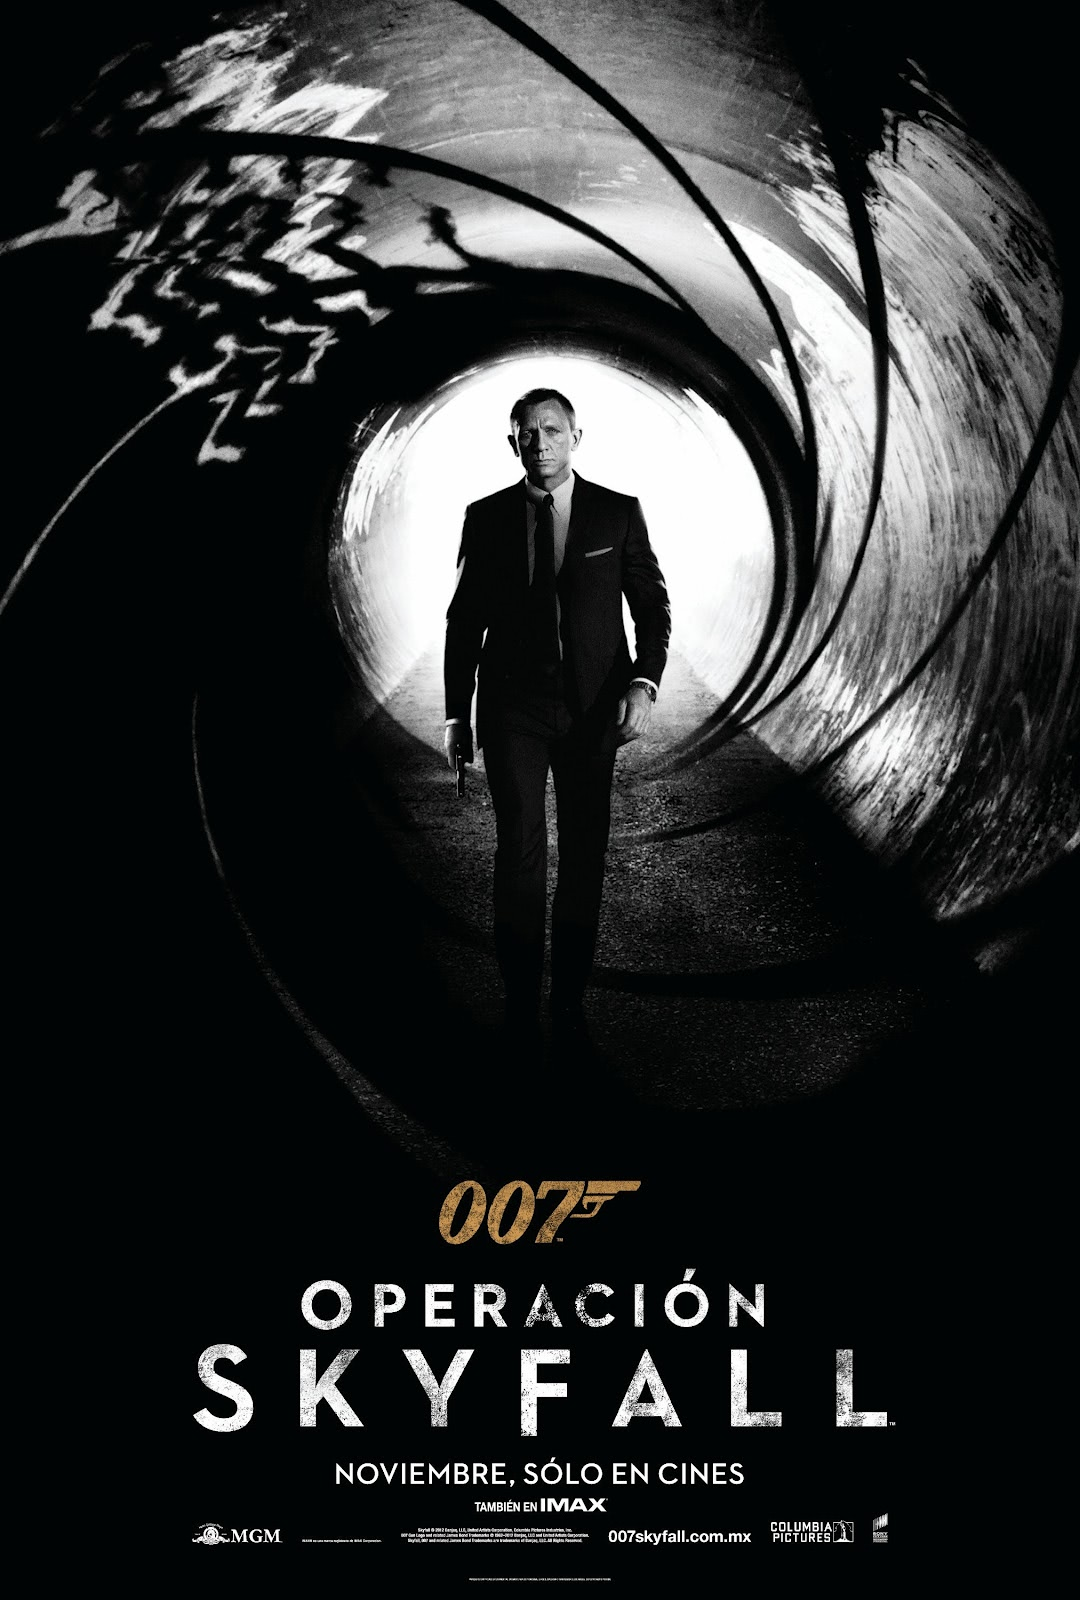 Operacion+Skyfall+Poster.jpg